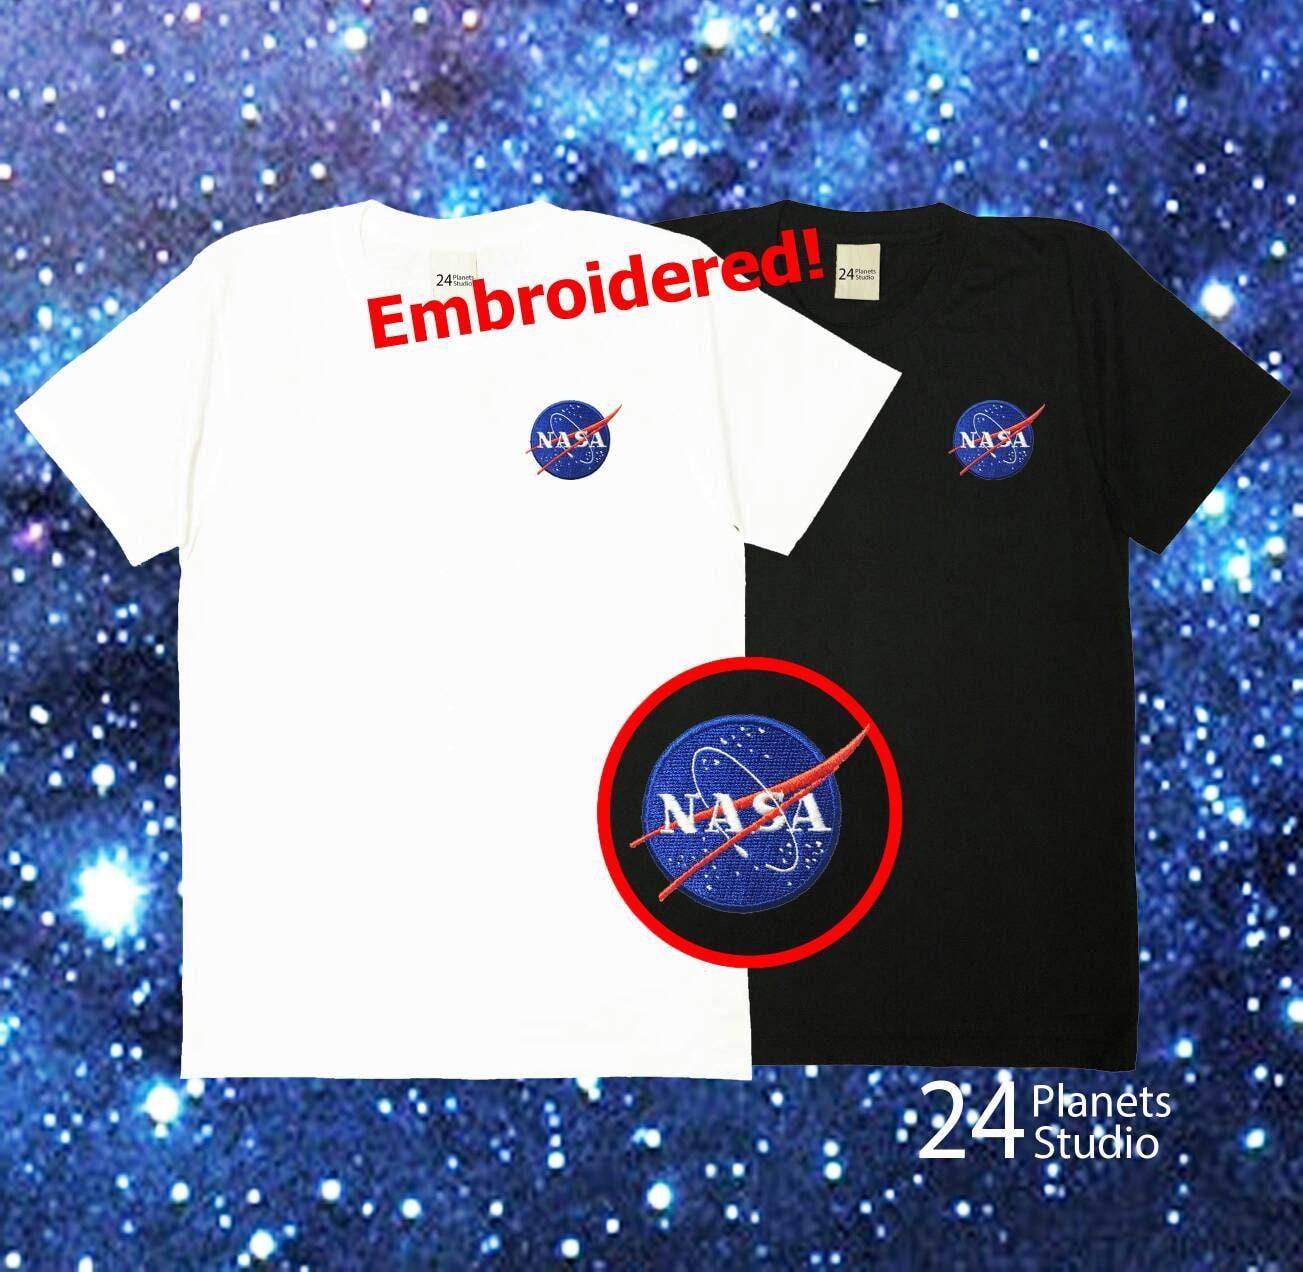 NASA 24PlanetsStudio poche Tshirt Tumblr Tee Shirt homme unisexe NASA Shirt Tee femme la NASA Tee peigne coton à broder T-Shirt e706cb